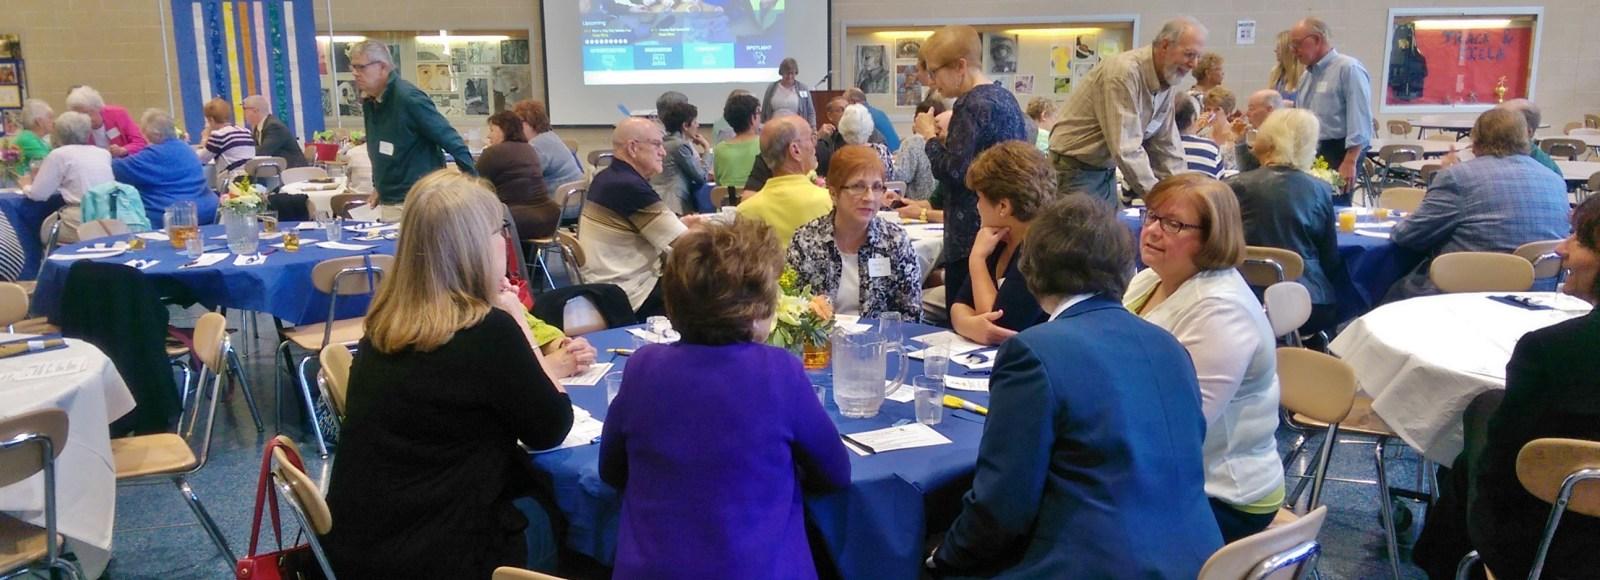 Foundation hosts Penn Manor retirees at annual breakfast